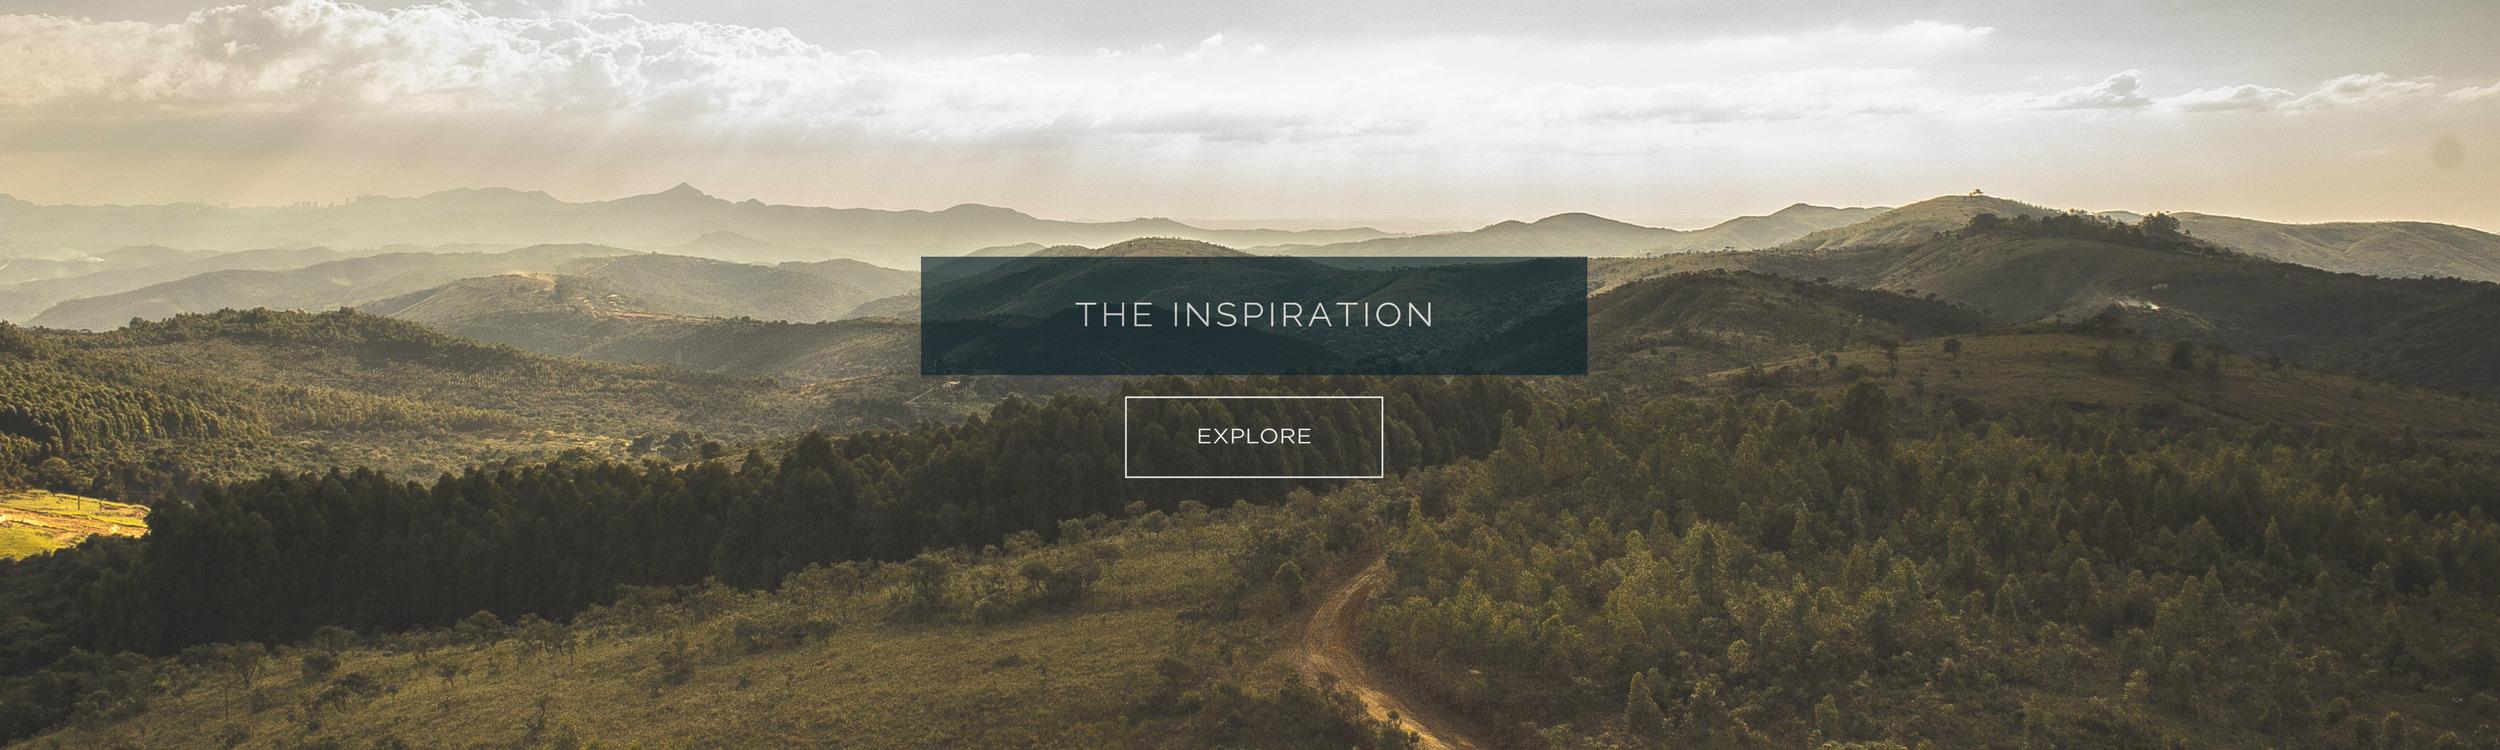 The Inspiration Home.jpg